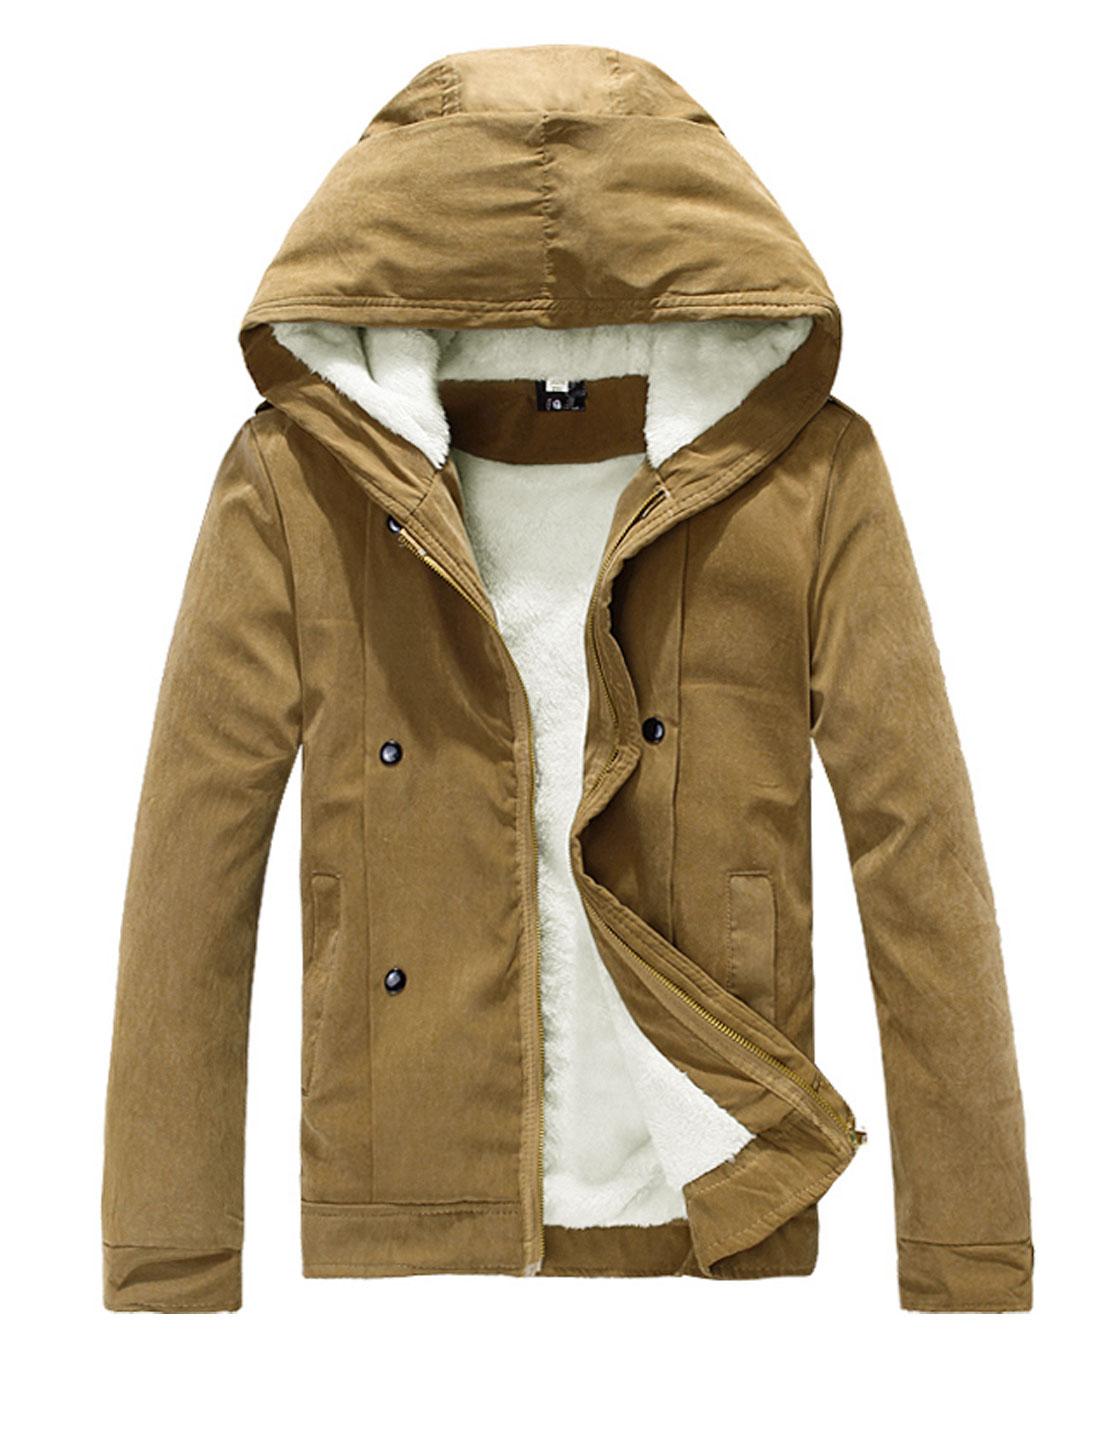 New Style Leisure Hooded Design Fleece Inside Jacket for Men Camel M